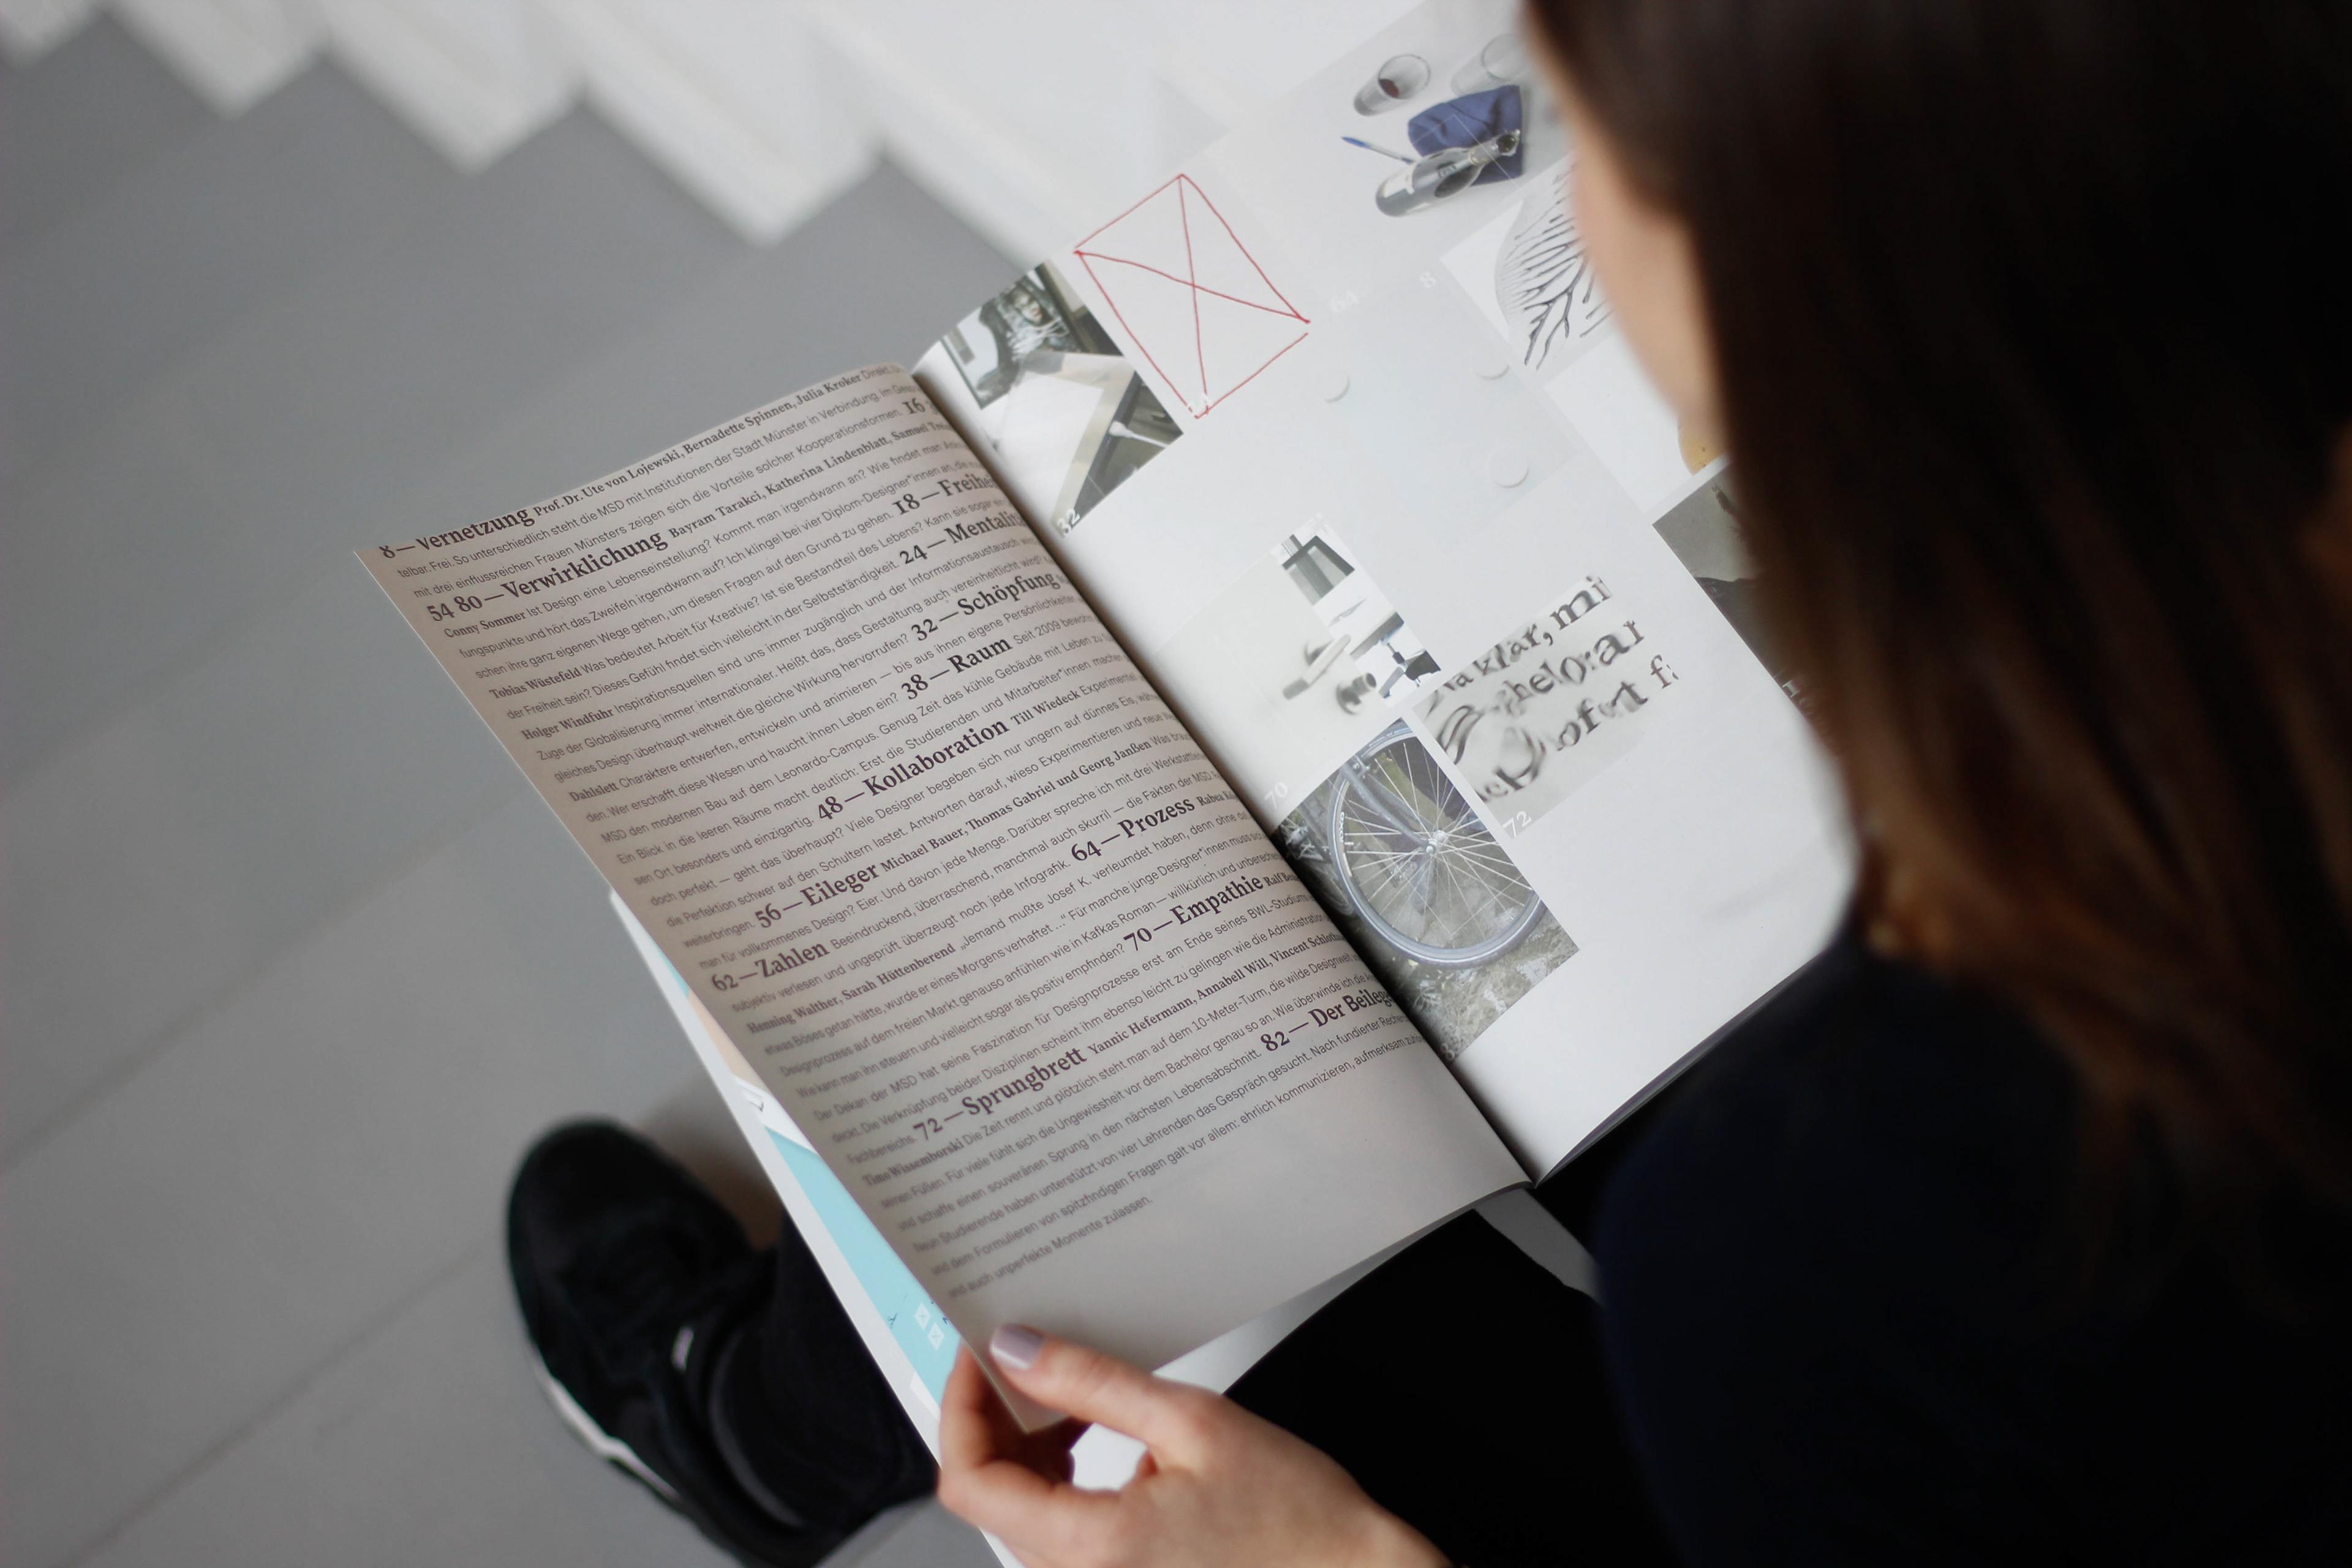 Marie Reckendrees - Der Beileger | Editorial Design